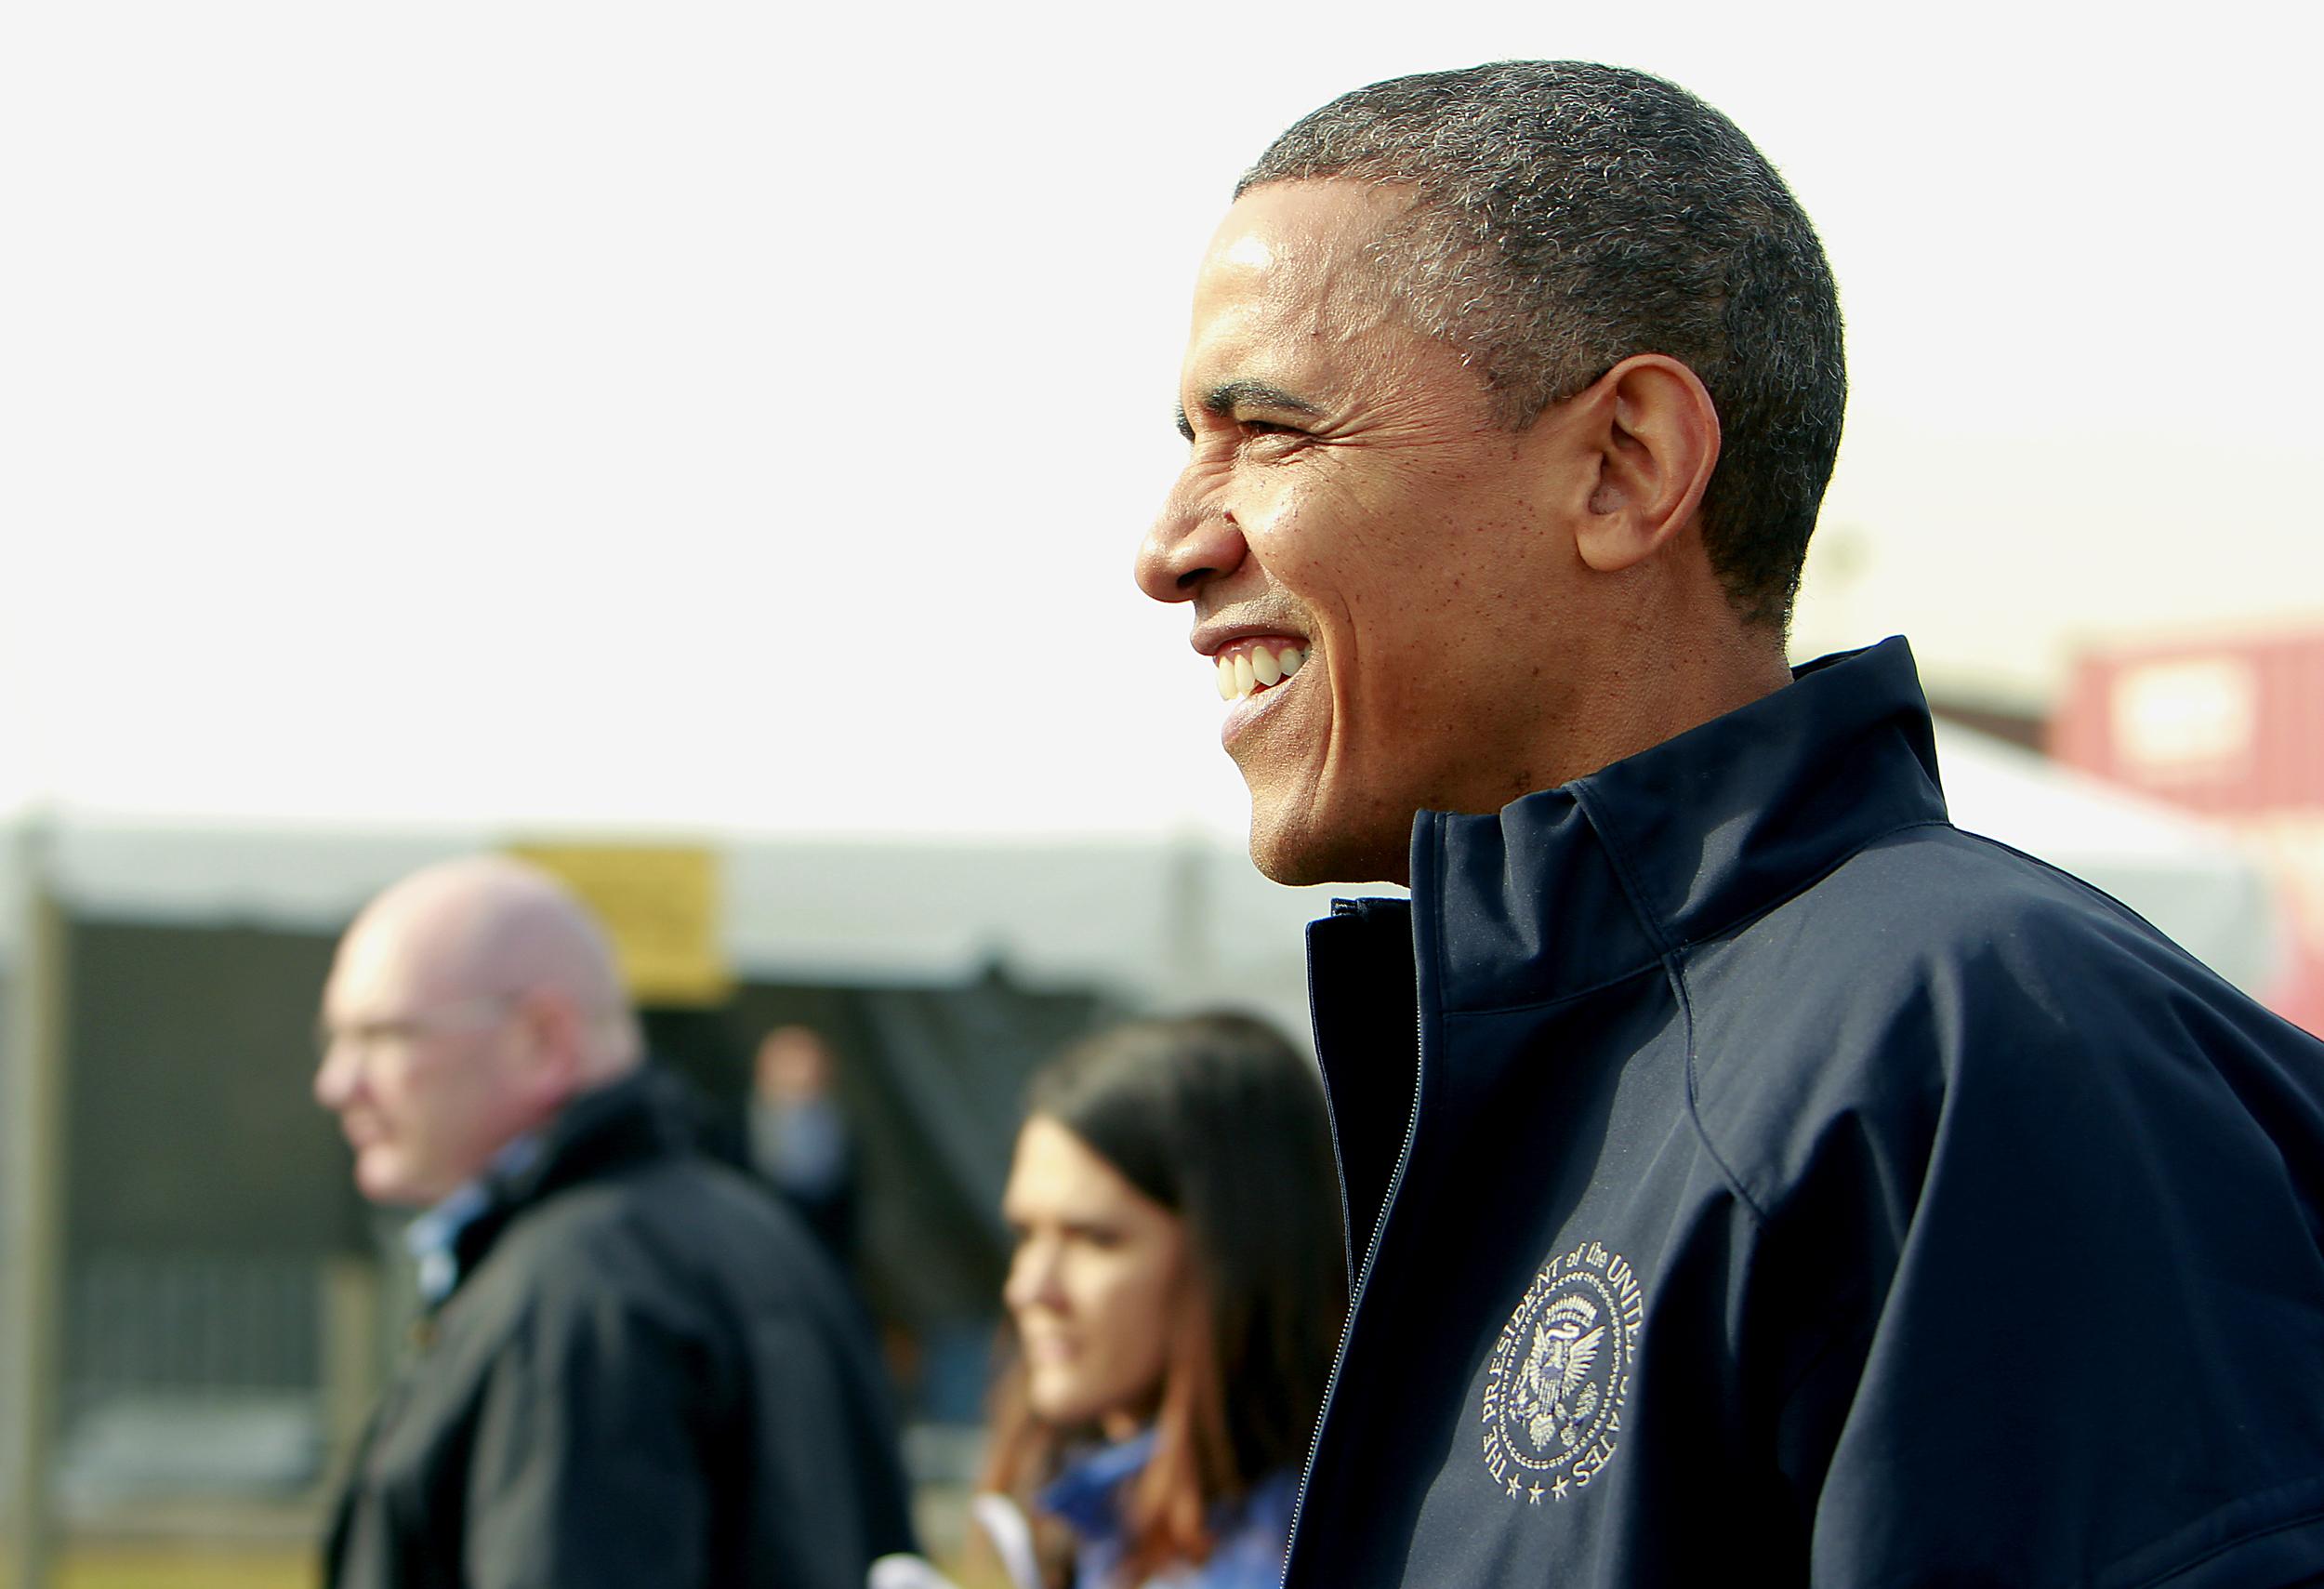 P1 Obama16 31.jpg